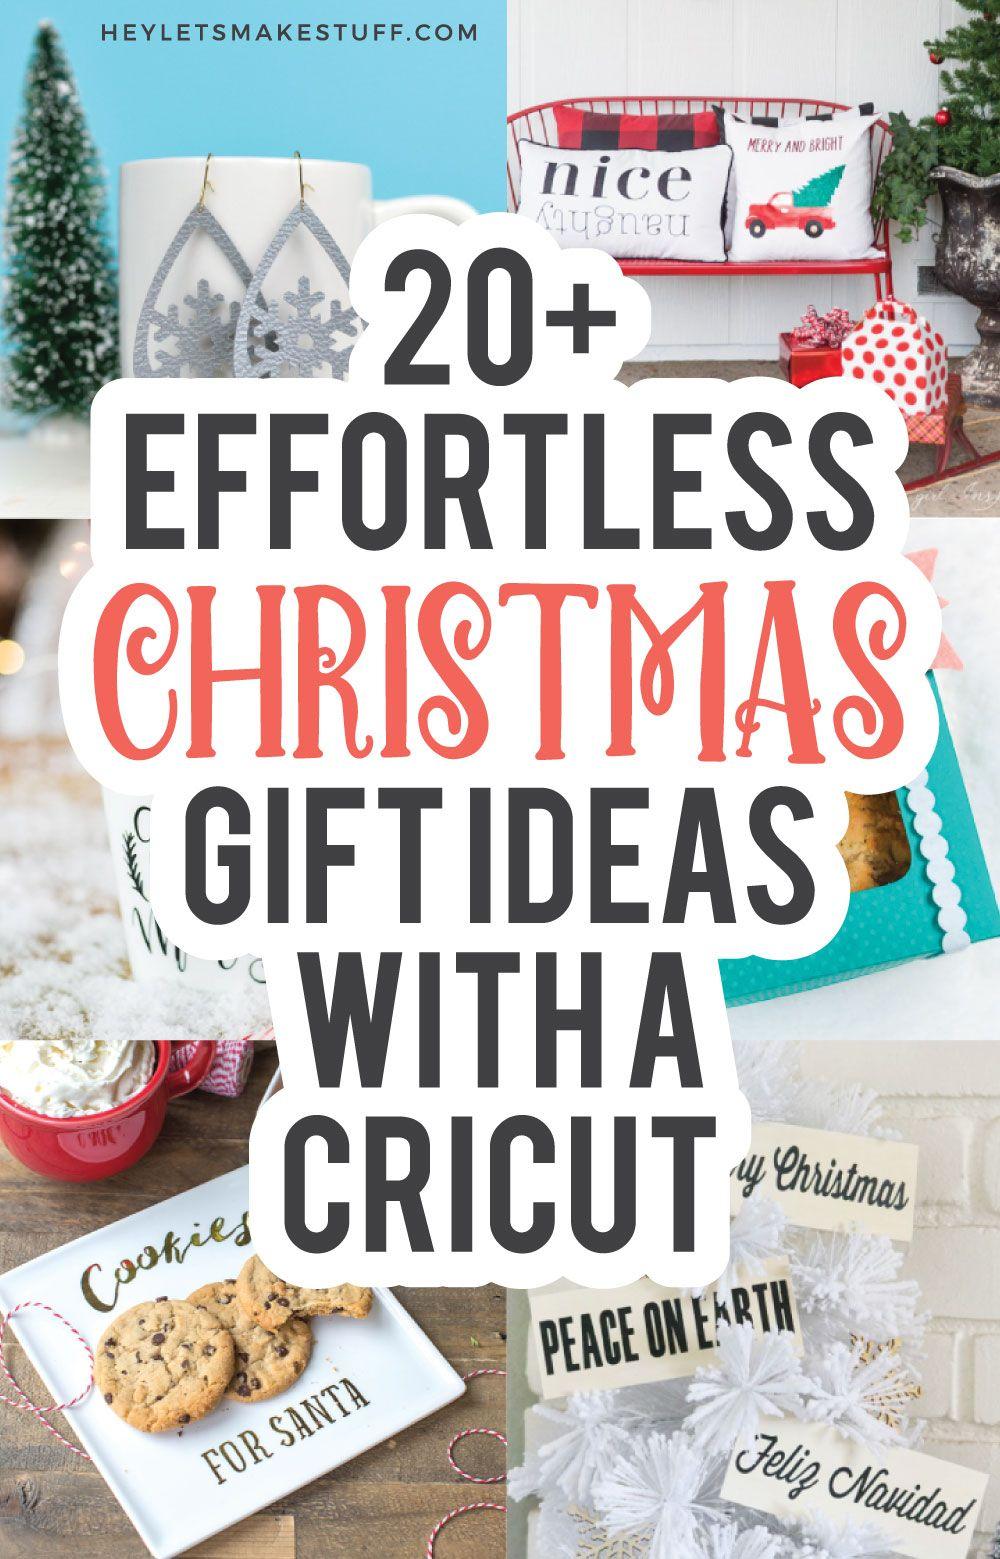 Easy Cricut Christmas Gift Ideas In 2020 Cricut Projects Christmas Cricut Christmas Ideas Crafty Christmas Gifts